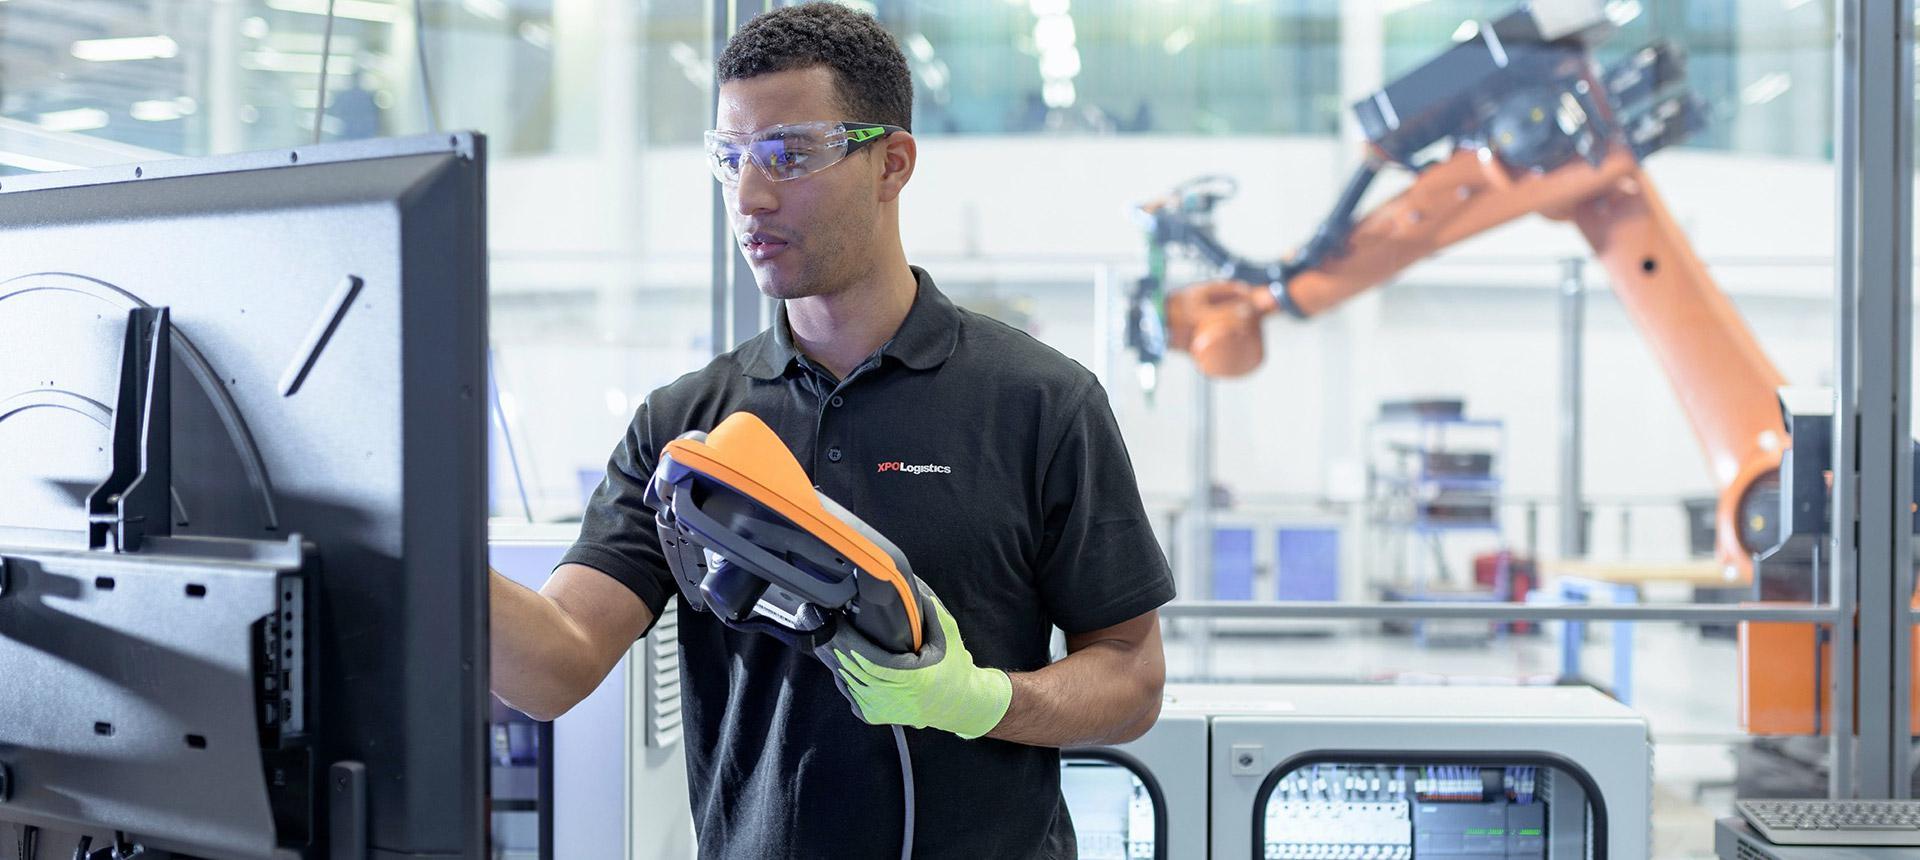 XPO employee holding robot